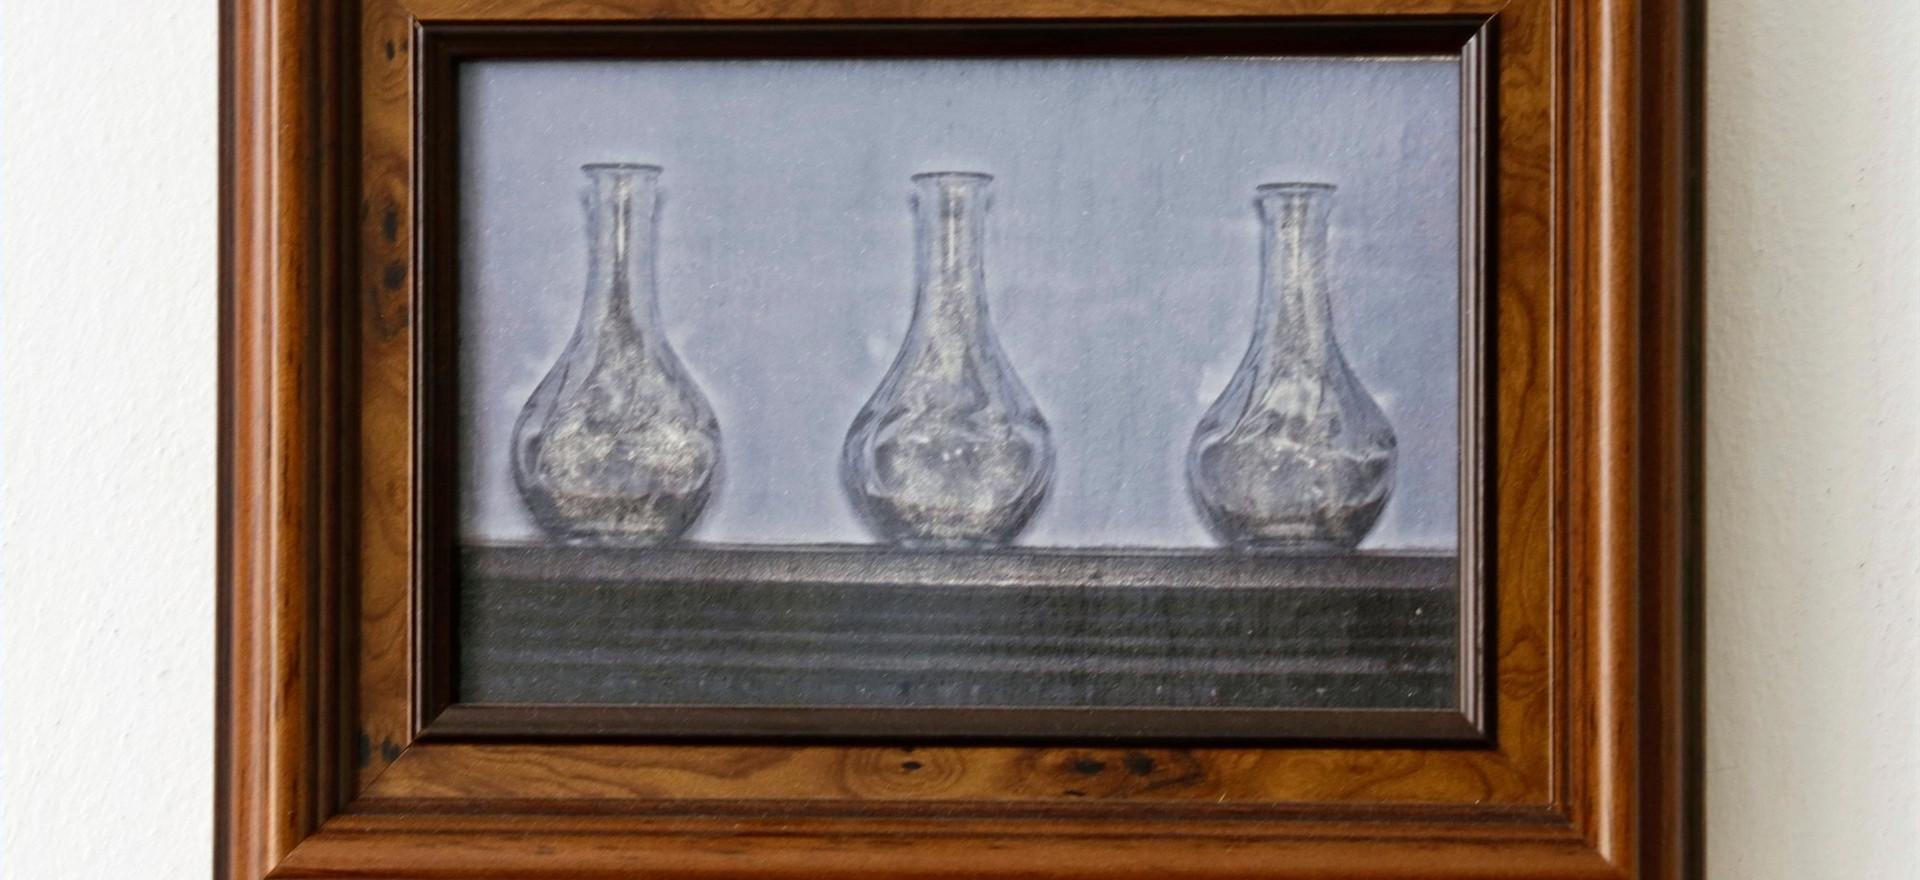 Glass Vases 1 in wooden frame